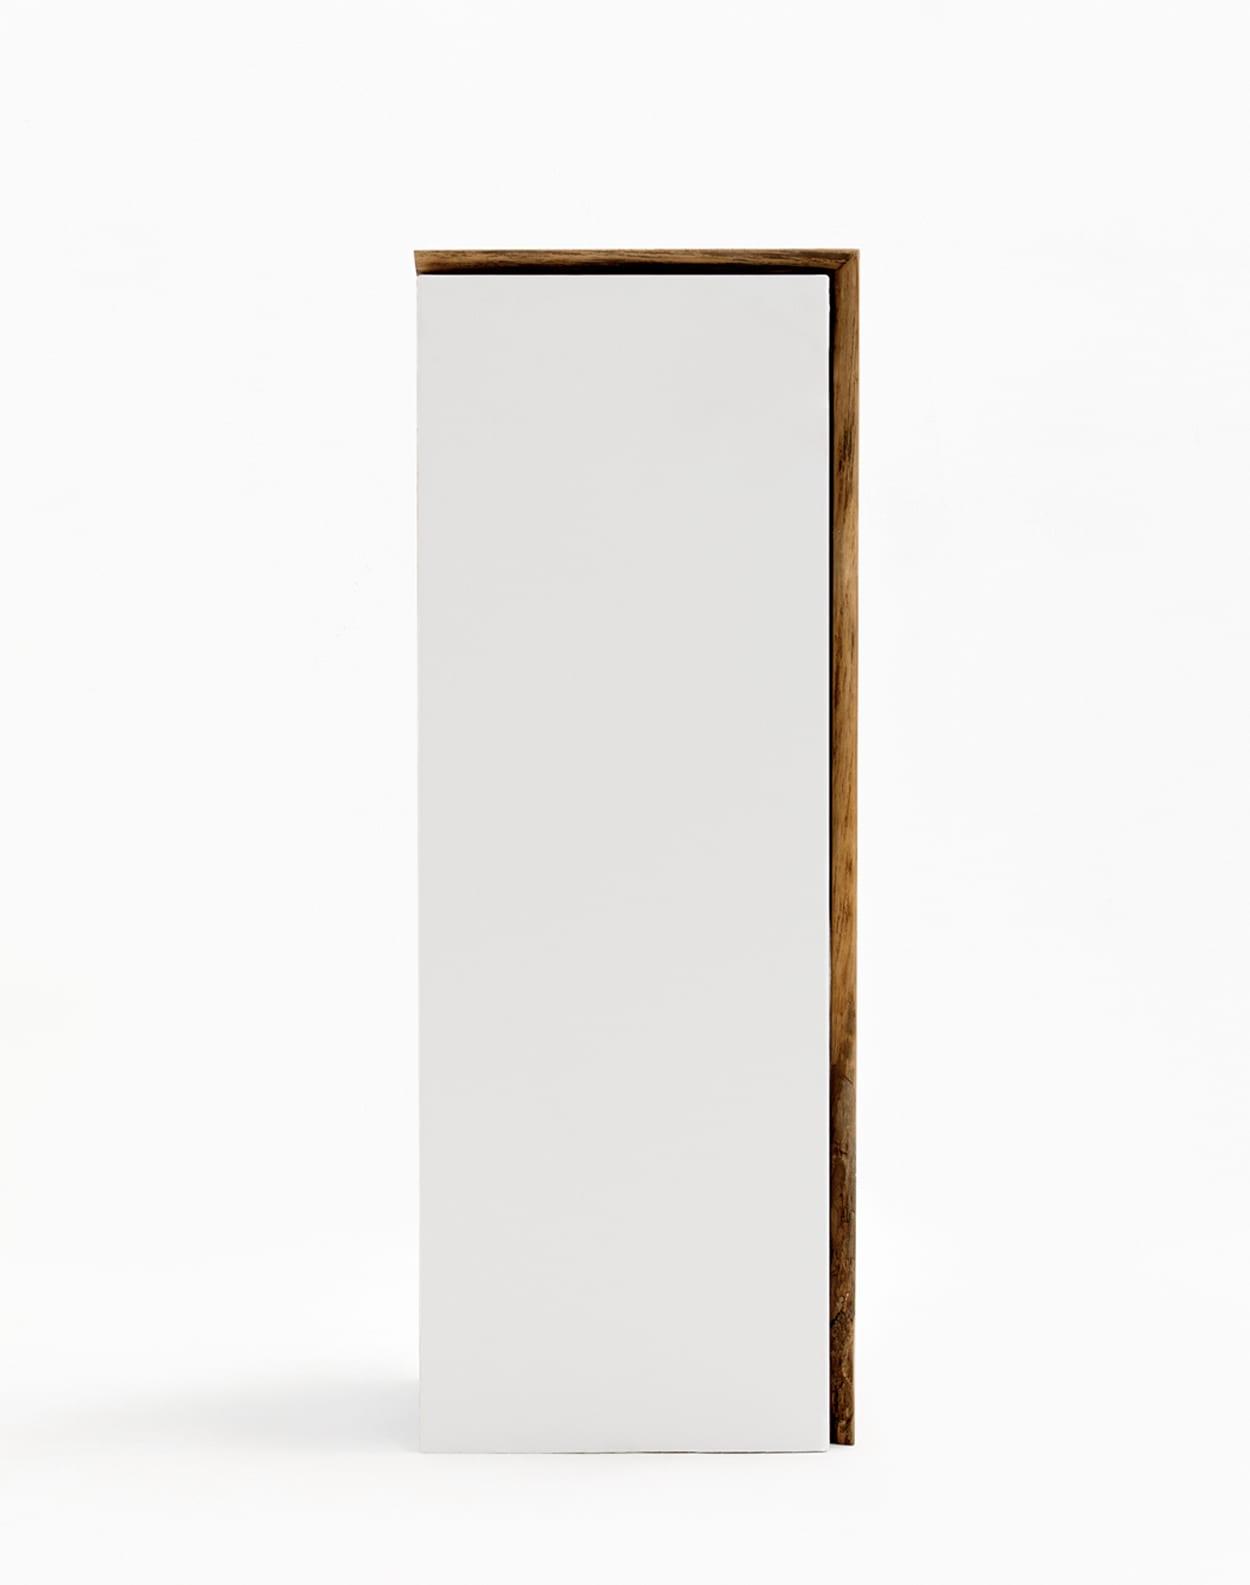 Wood Speaker_web_2__0000_Layer Comp 1